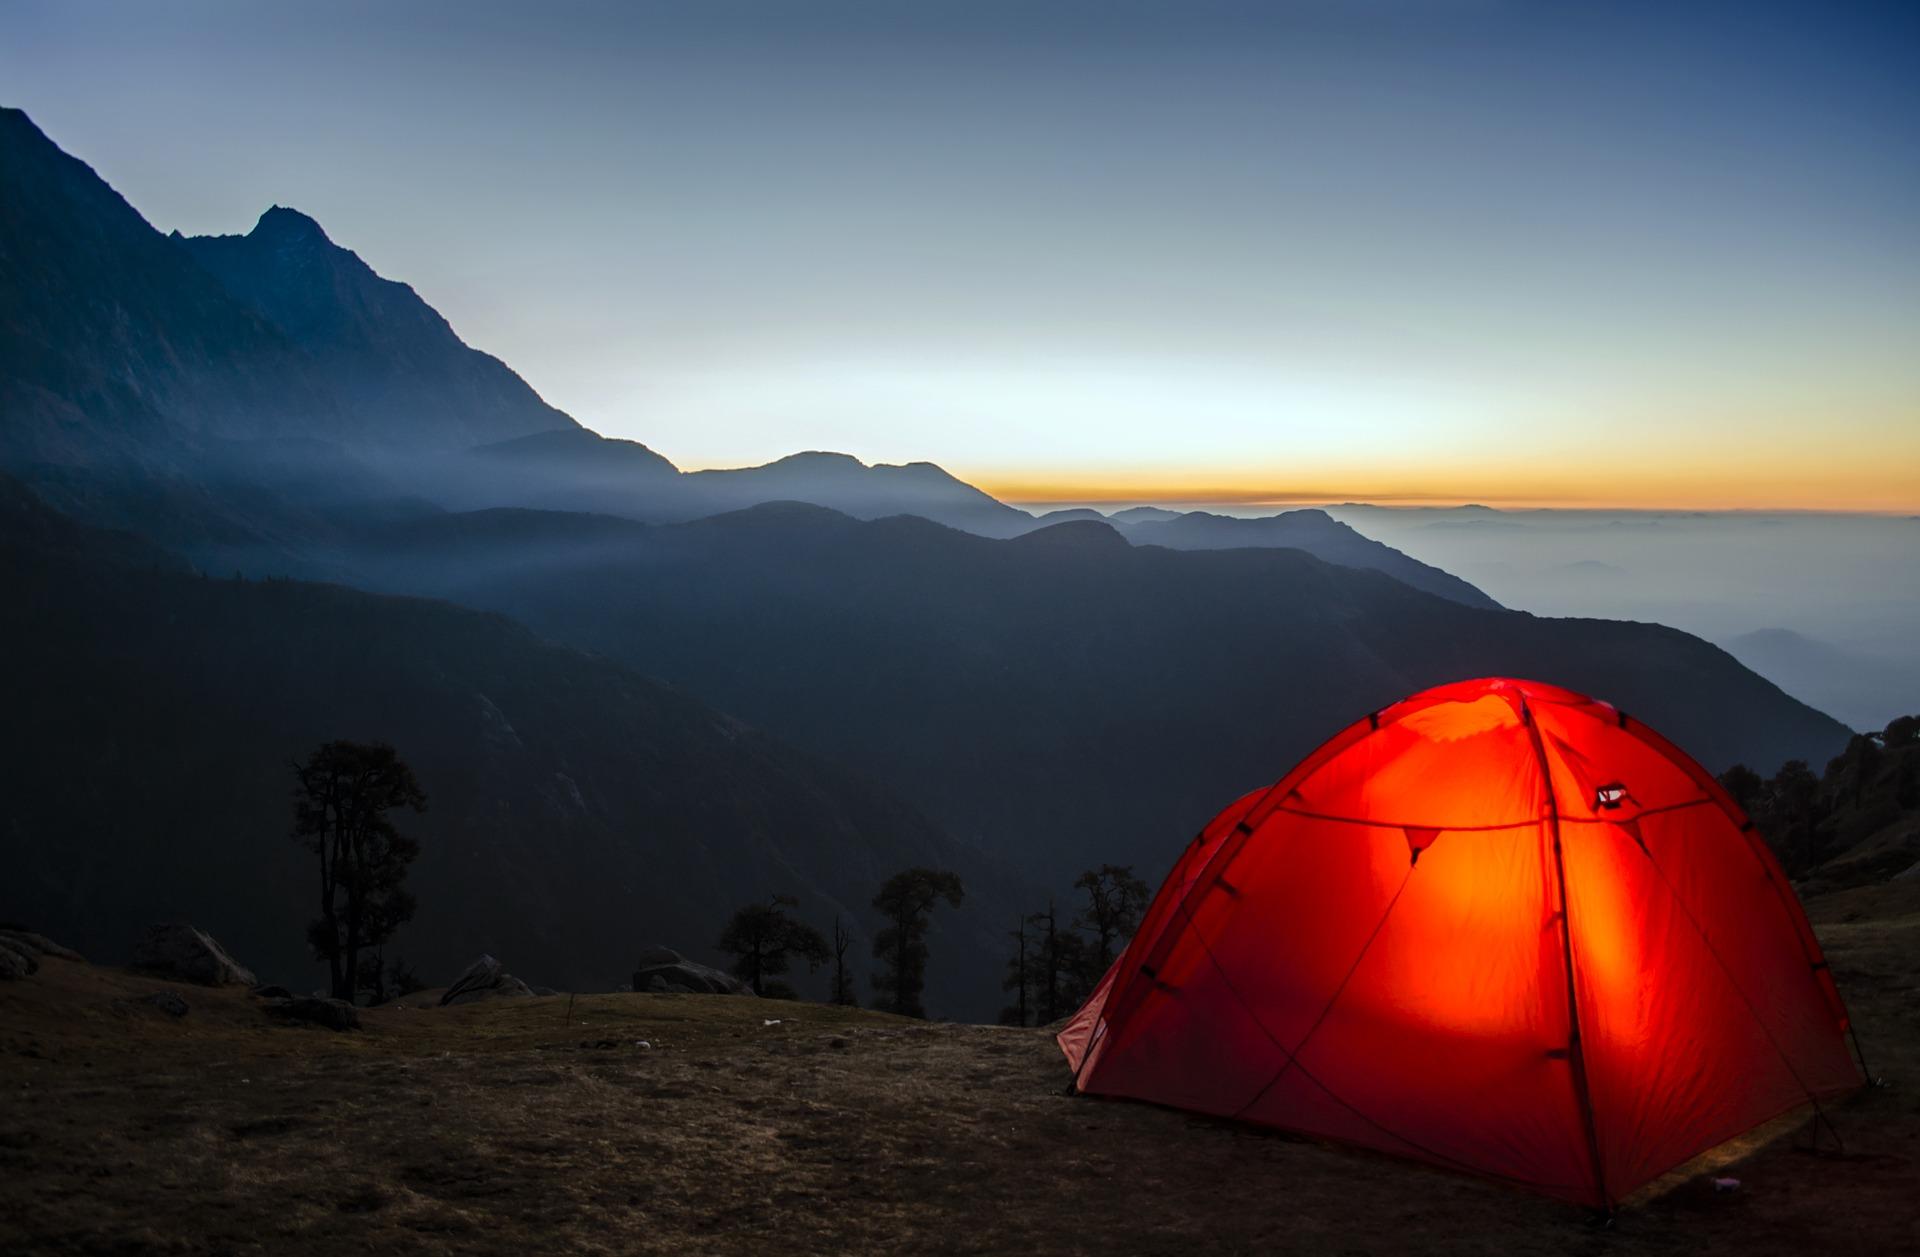 camping-2581242_1920.jpg